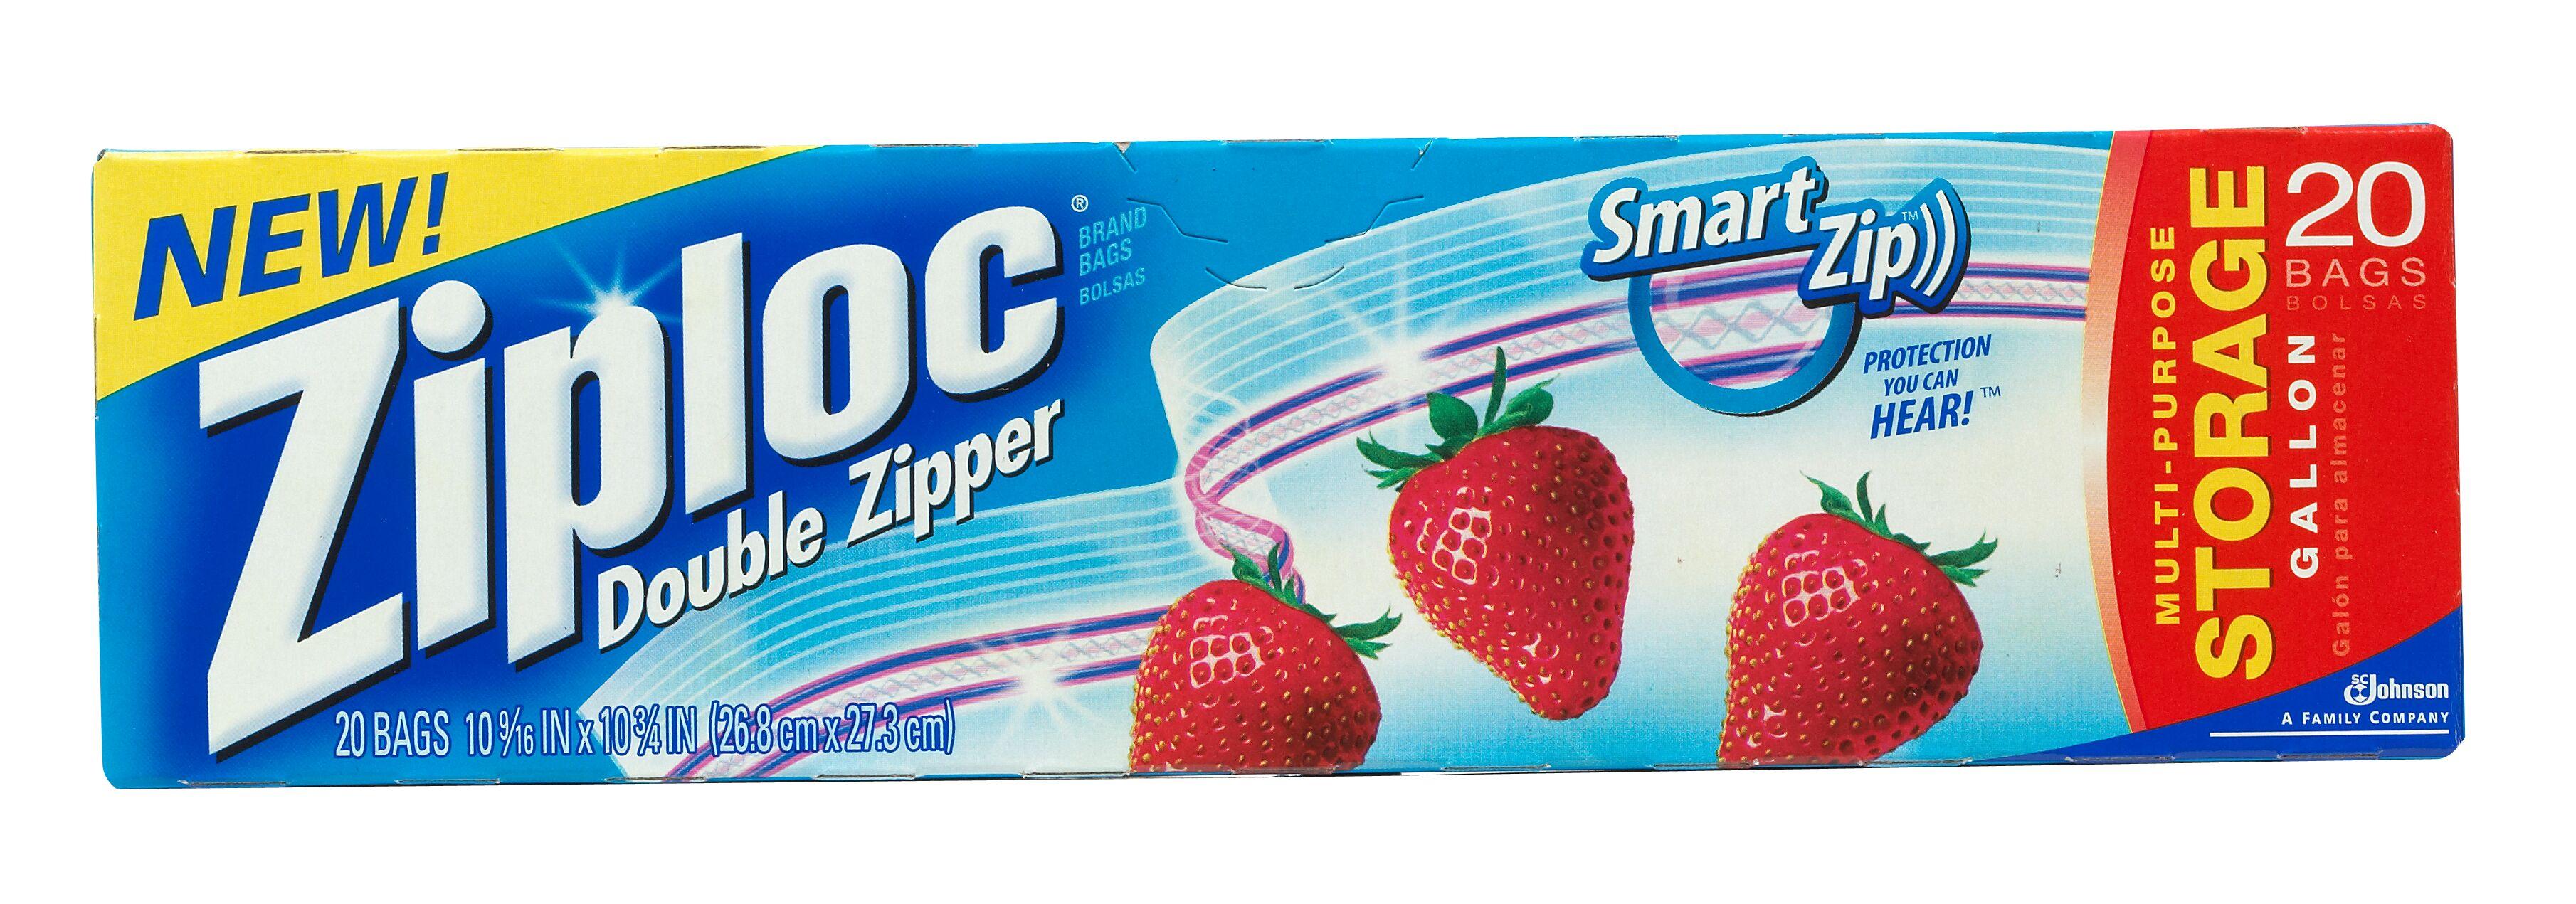 Ziploc_Double_Zipper_Multi-Purpose_Storage_Bags,_Smart_Zip,_Gallon[1]